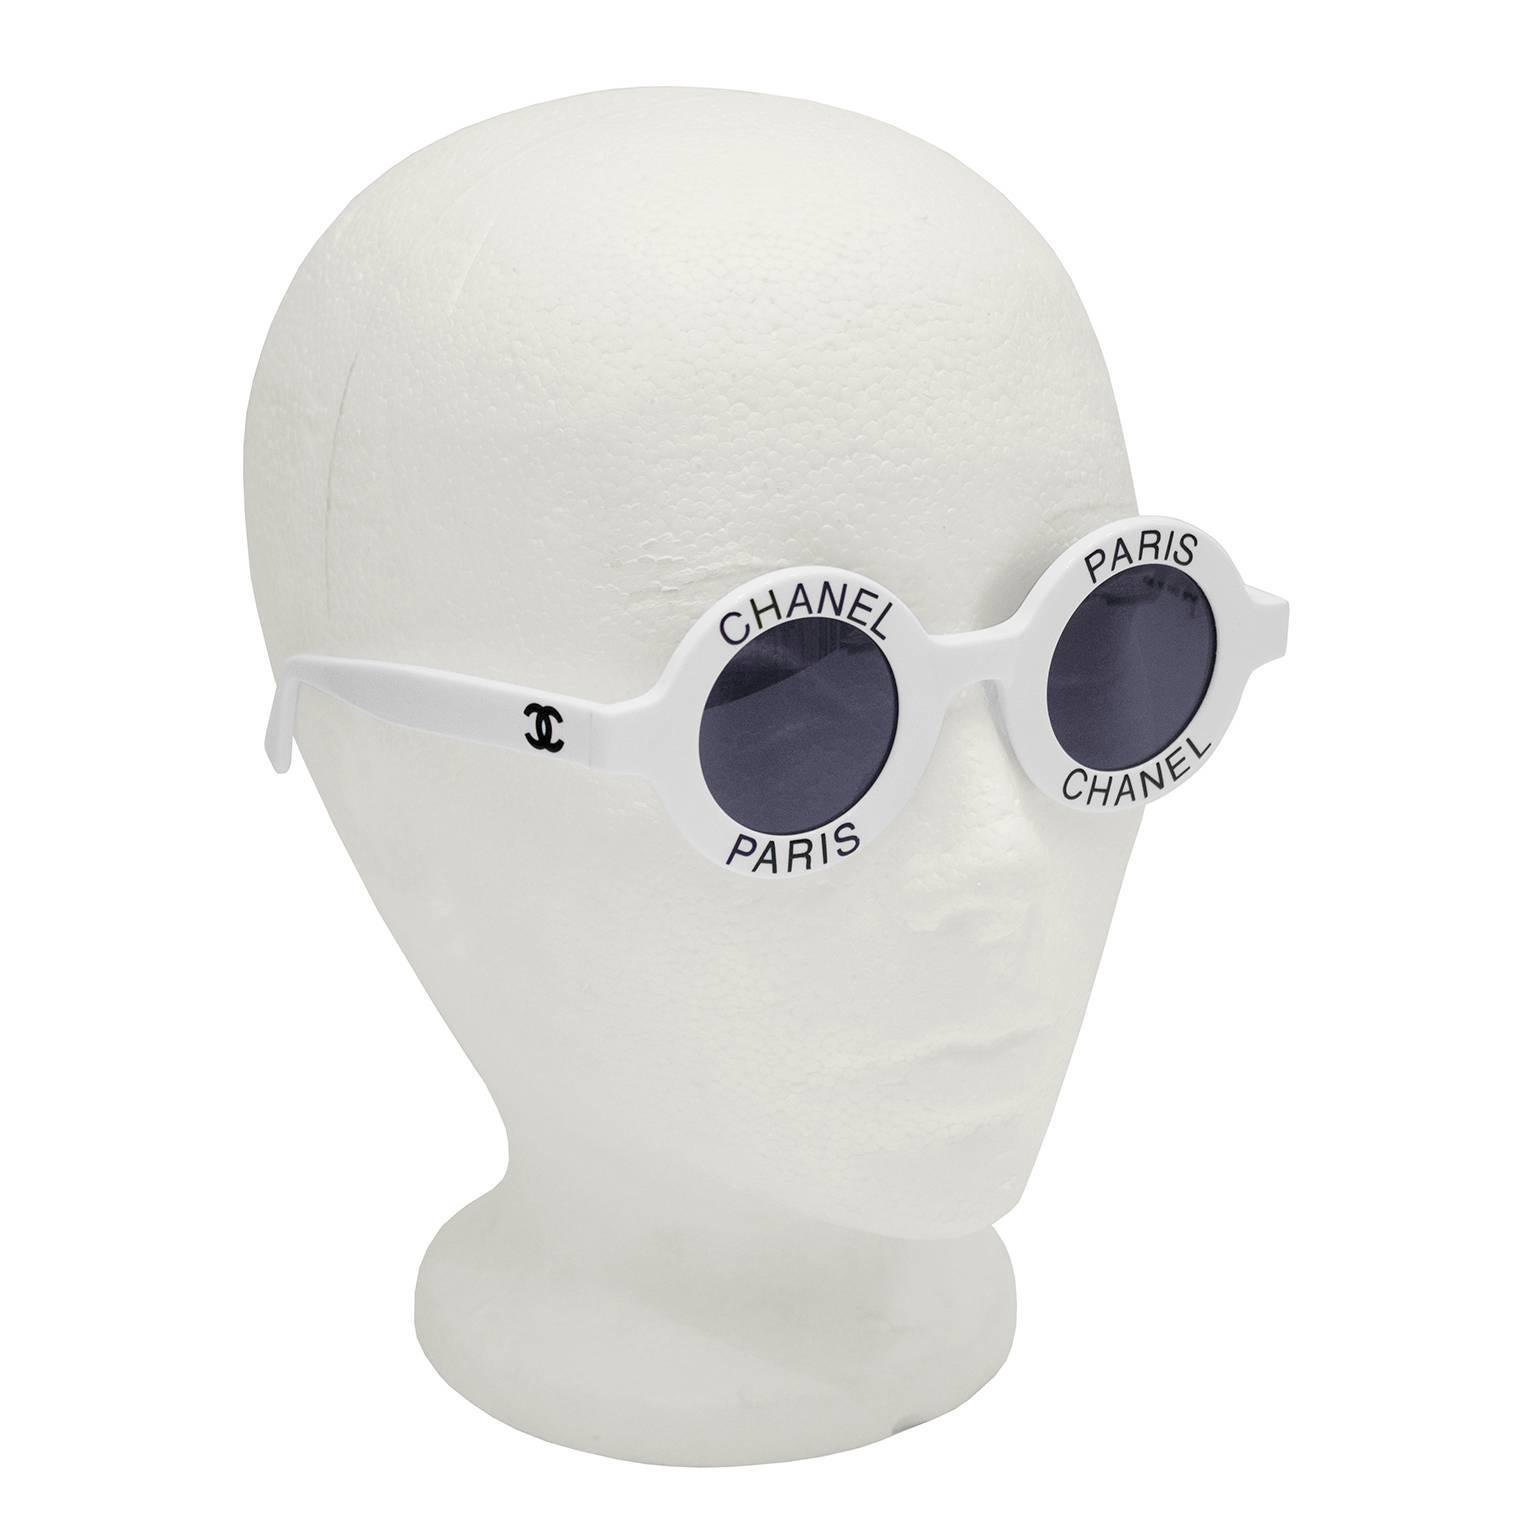 1990's Iconic White Chanel Paris Round Sunglasses